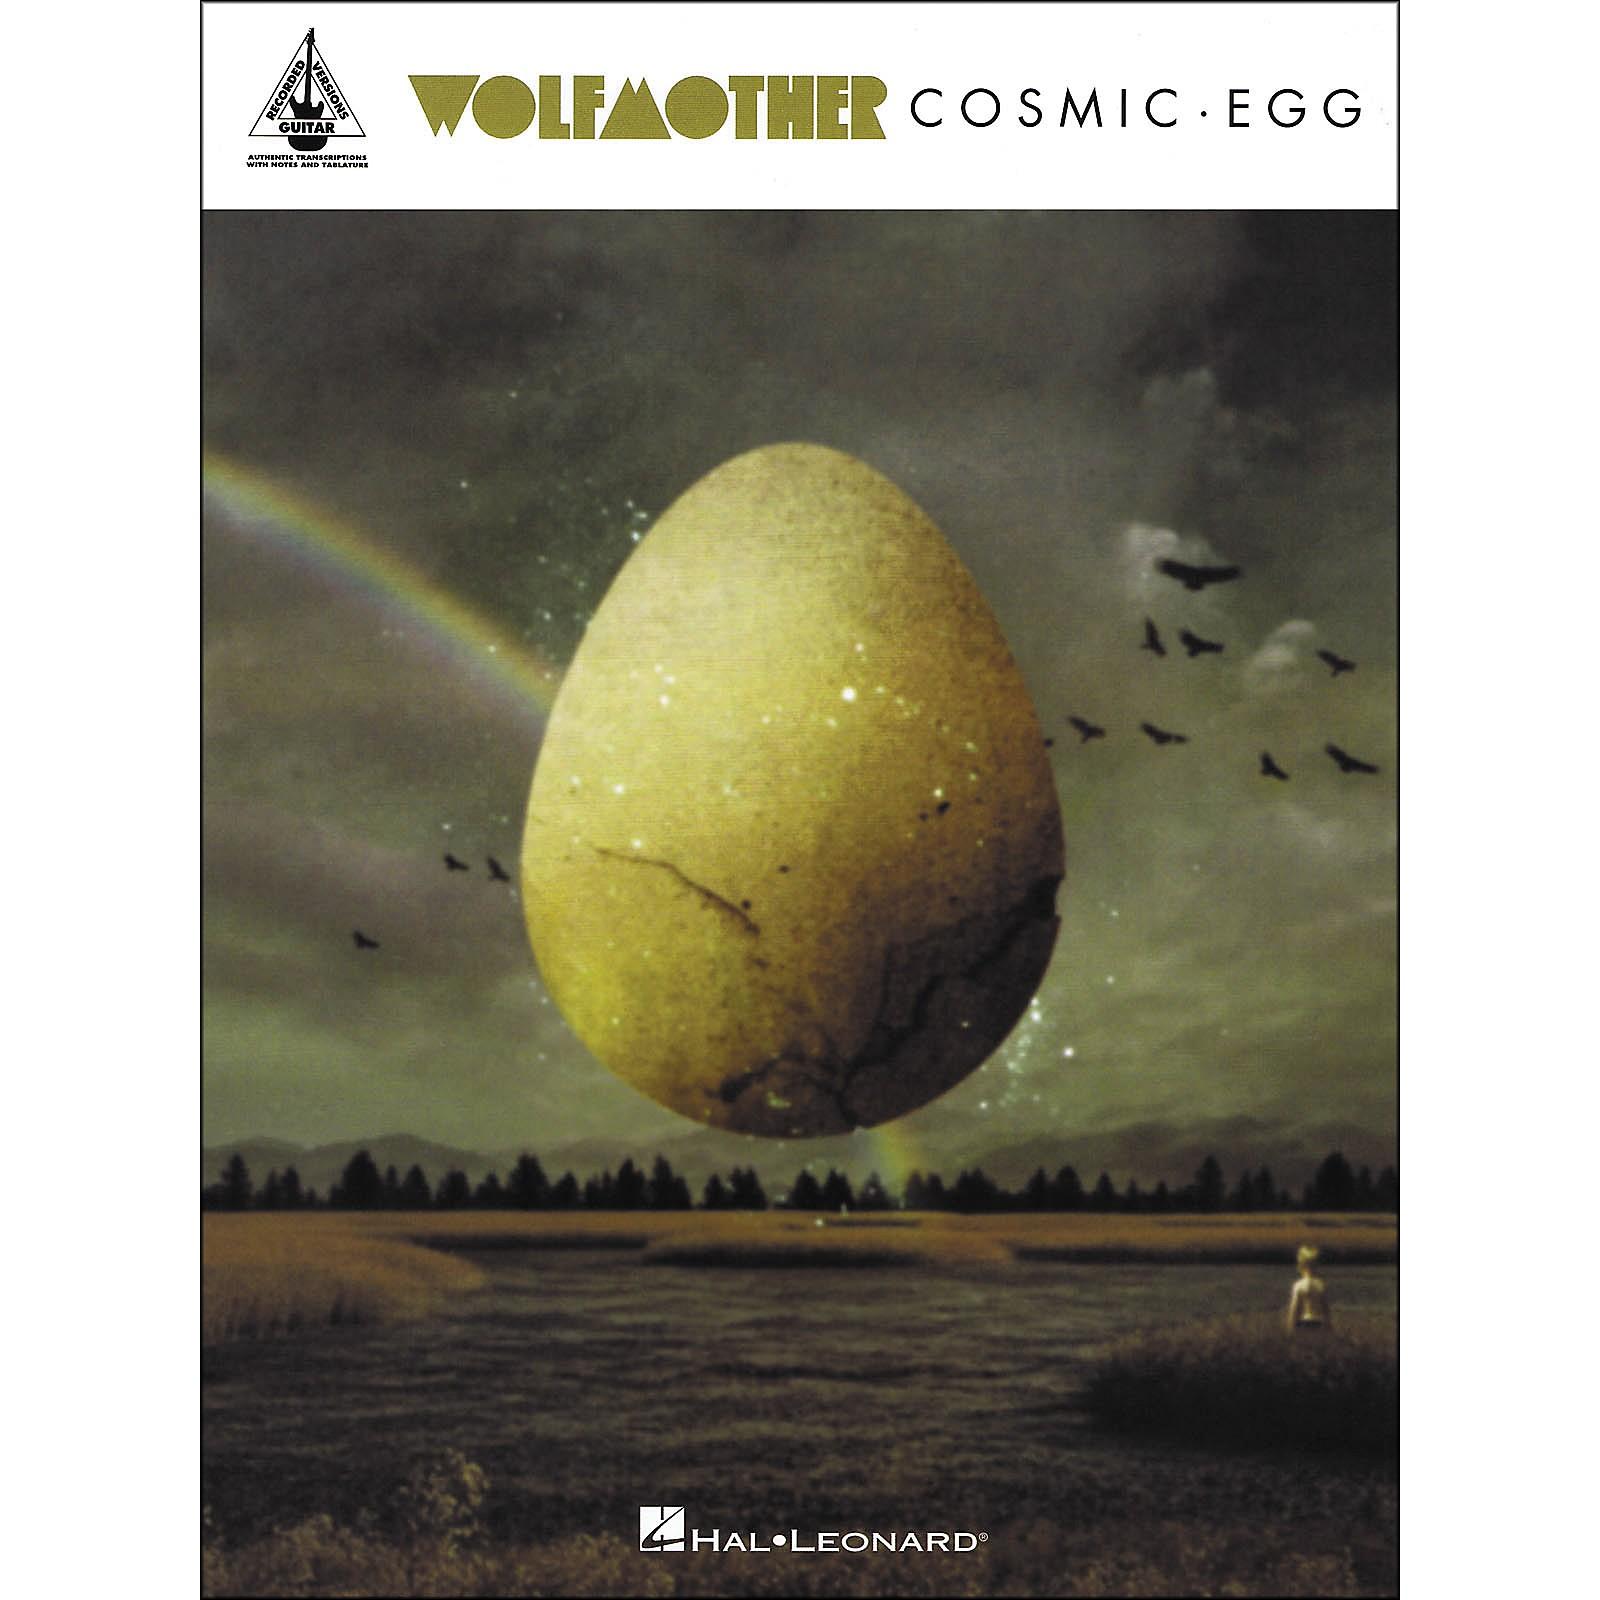 Hal Leonard Wolfmother - Cosmic Egg Tab Book